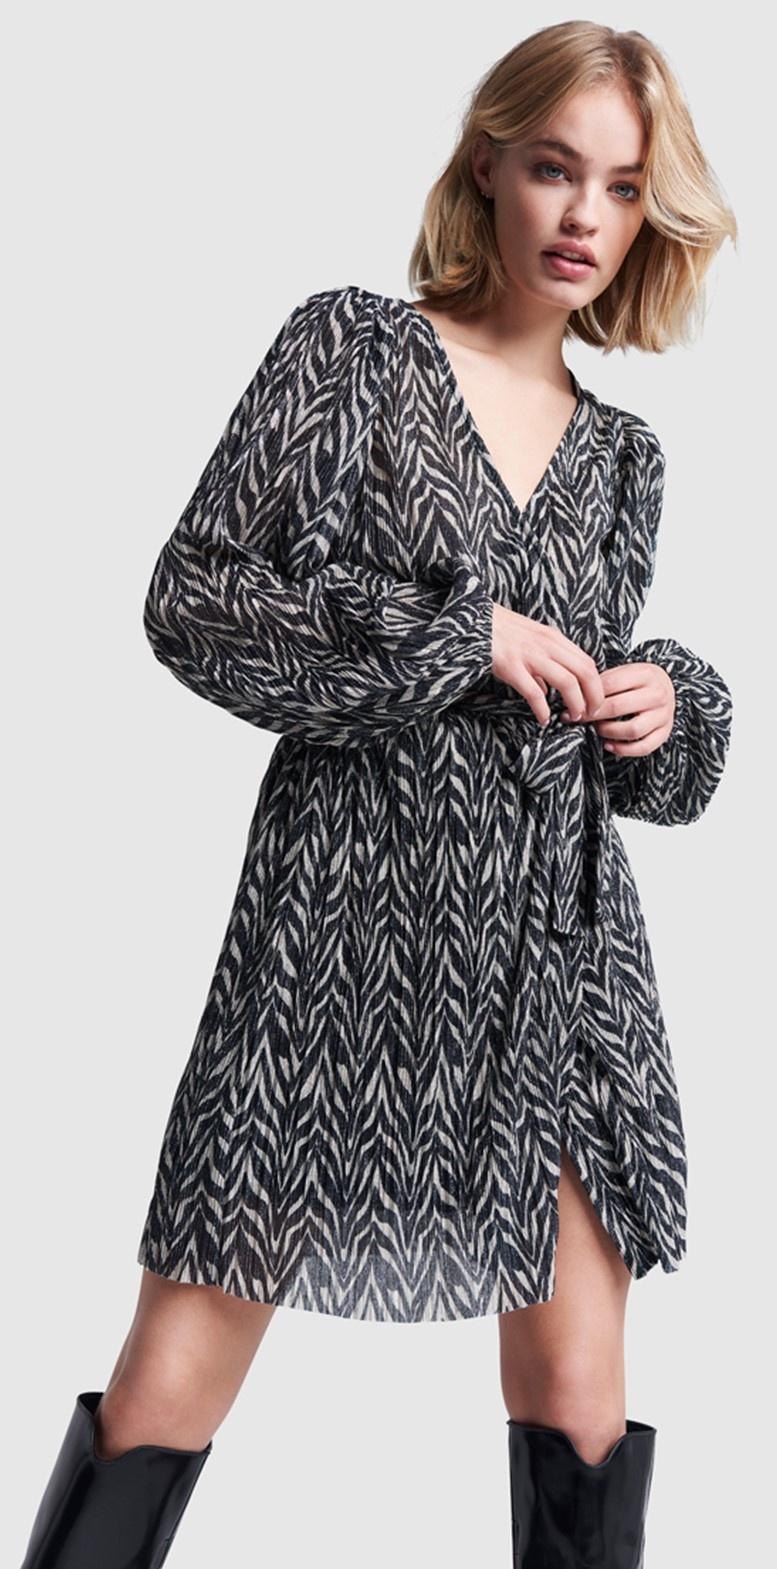 Jurk ladies knitted zebra lurex dress black-5